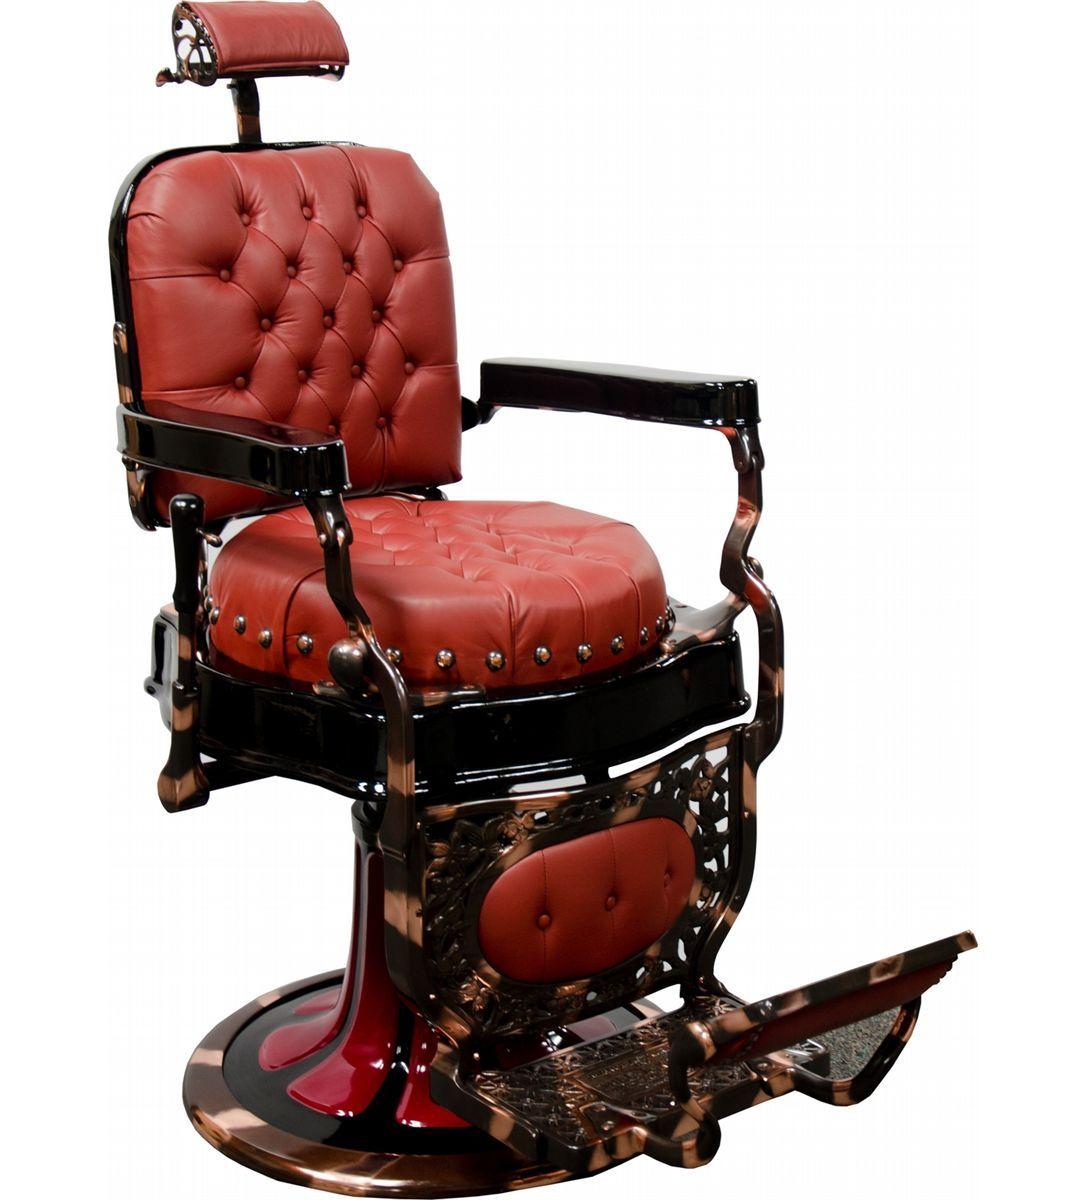 vintage barber chairs - Google Search - Vintage Barber Chairs - Google Search Who's Next ? (Barber